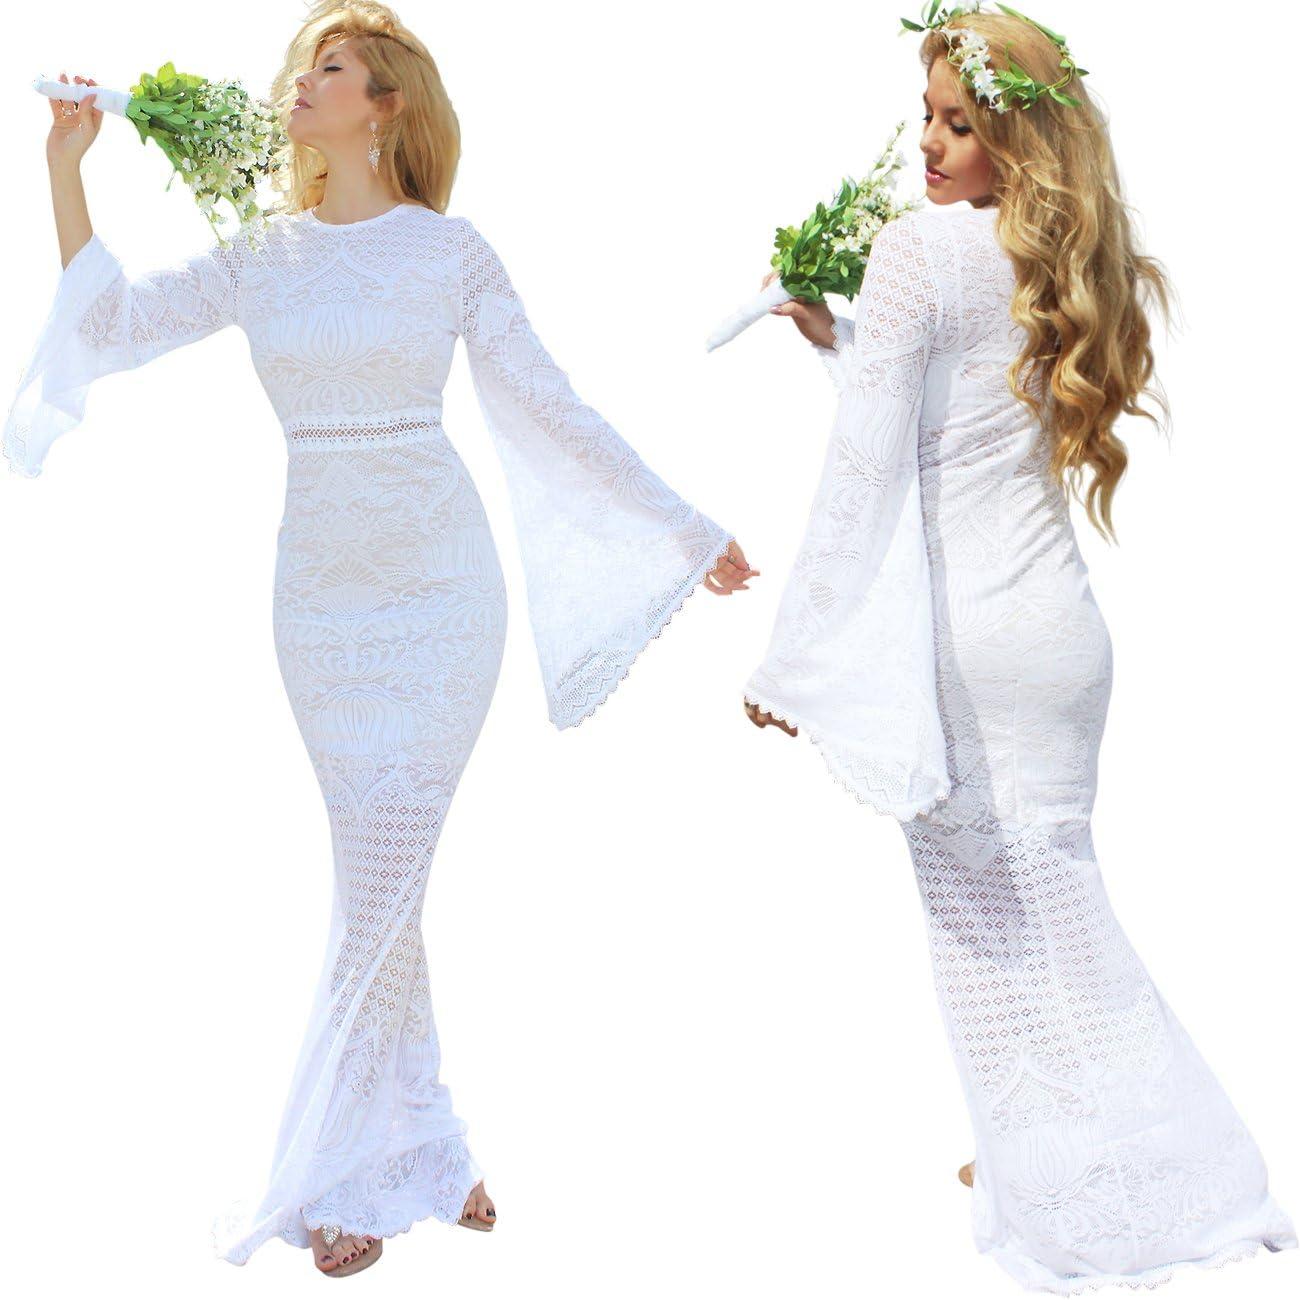 Boho Gypsy Wedding Dress Vintage Angel Bell Sleeve Goddess Bridal Dress Usa Made Casual Beach Wedding Dress At Amazon Women S Clothing Store